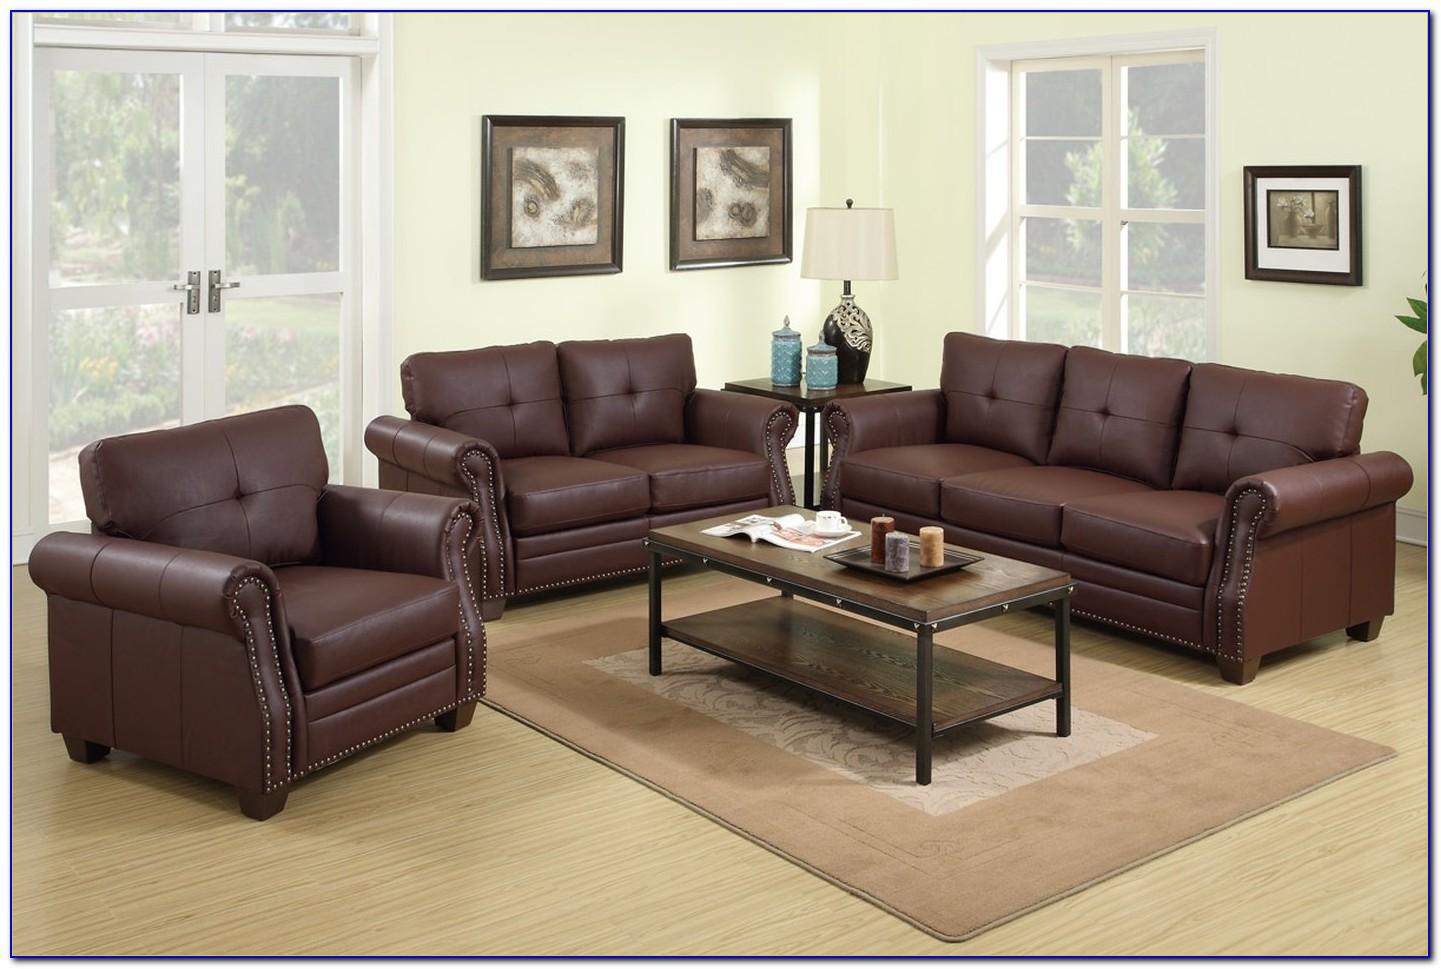 Sofa And Loveseat Set By Infini Furnishings